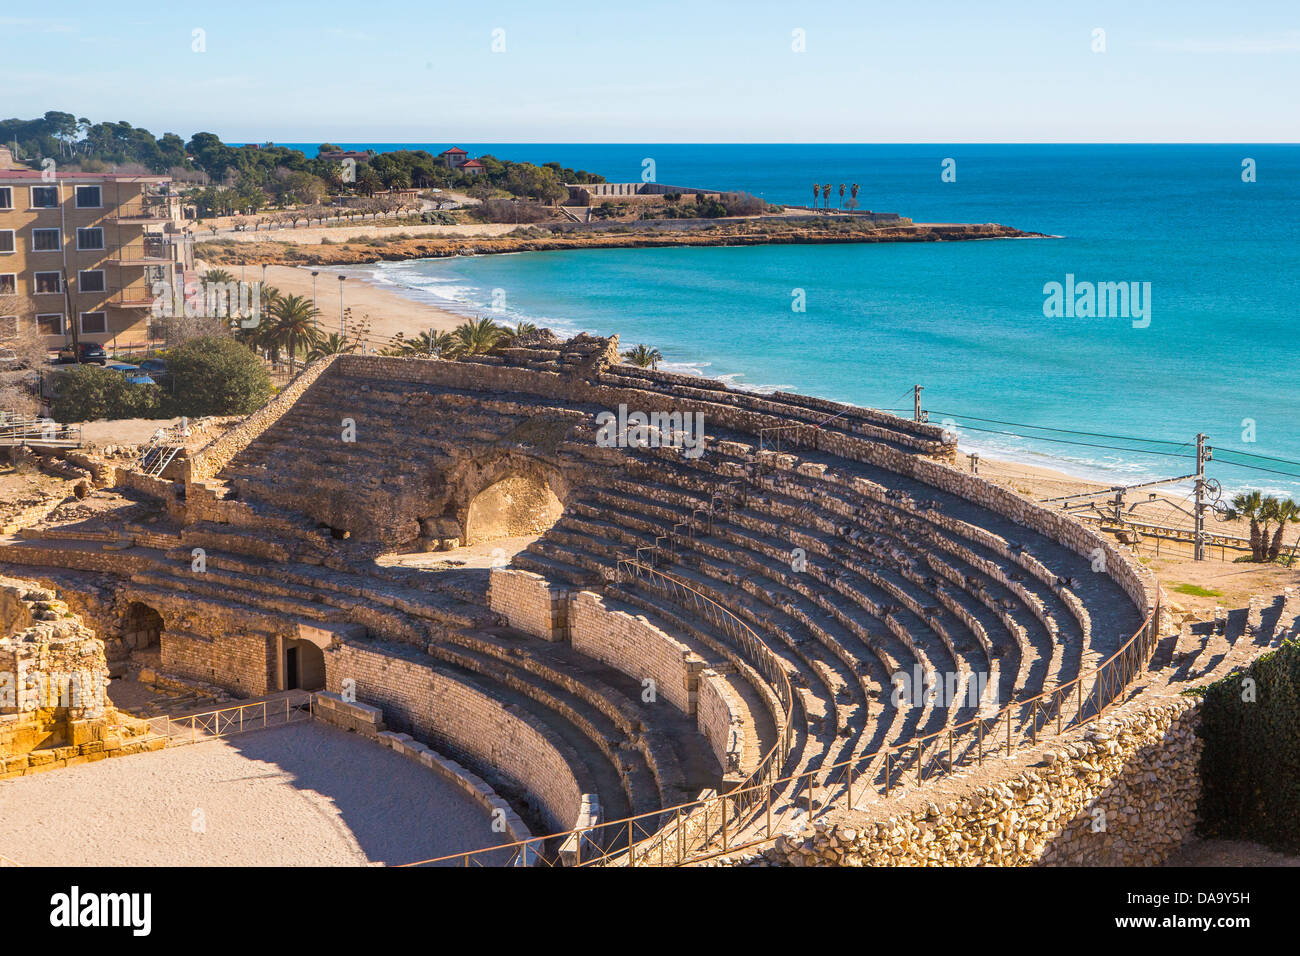 Spain, Europe, Catalonia, amphitheatre, architecture, beach, history, roman, ruins, skyline, tarraco, Tarragona, - Stock Image